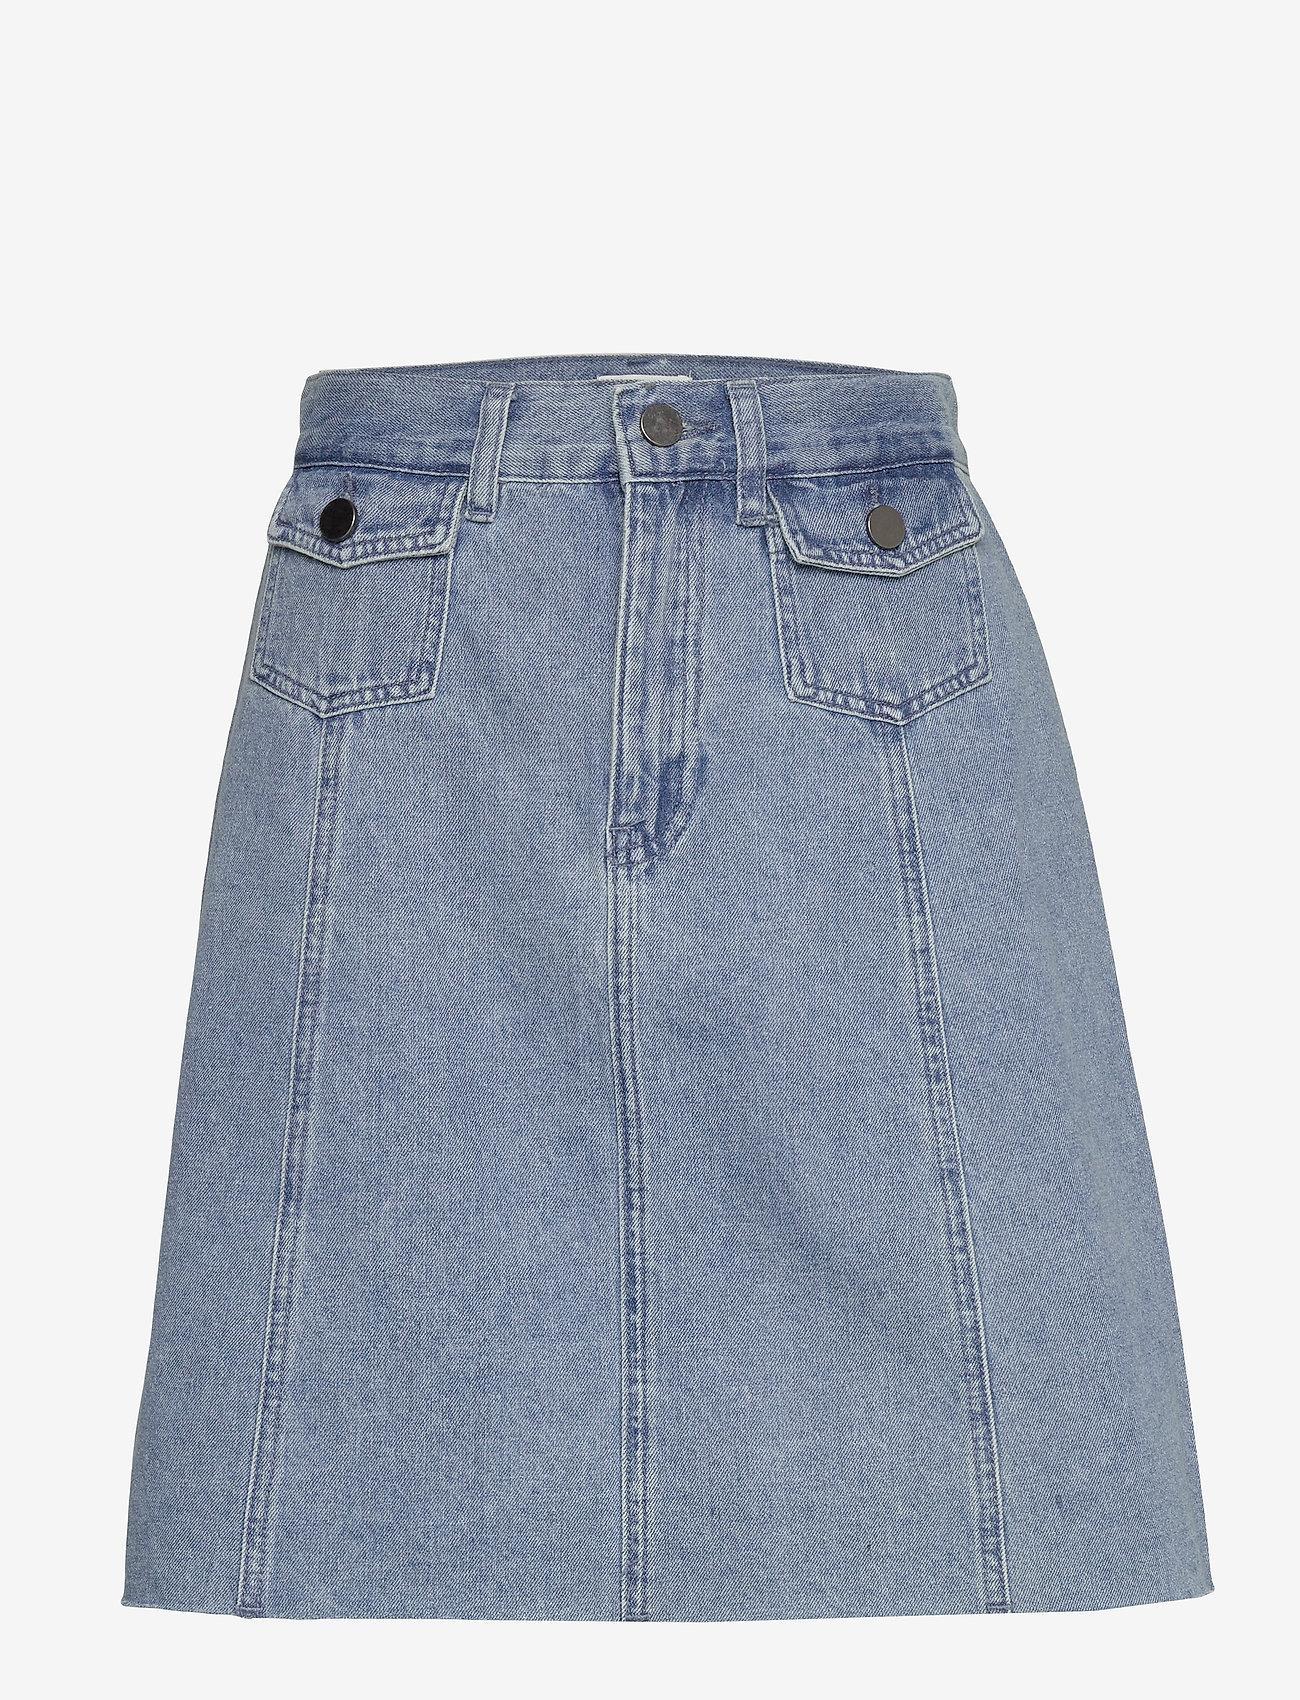 Minus - Lucca denim skirt - jupes en jeans - denim melange - 1